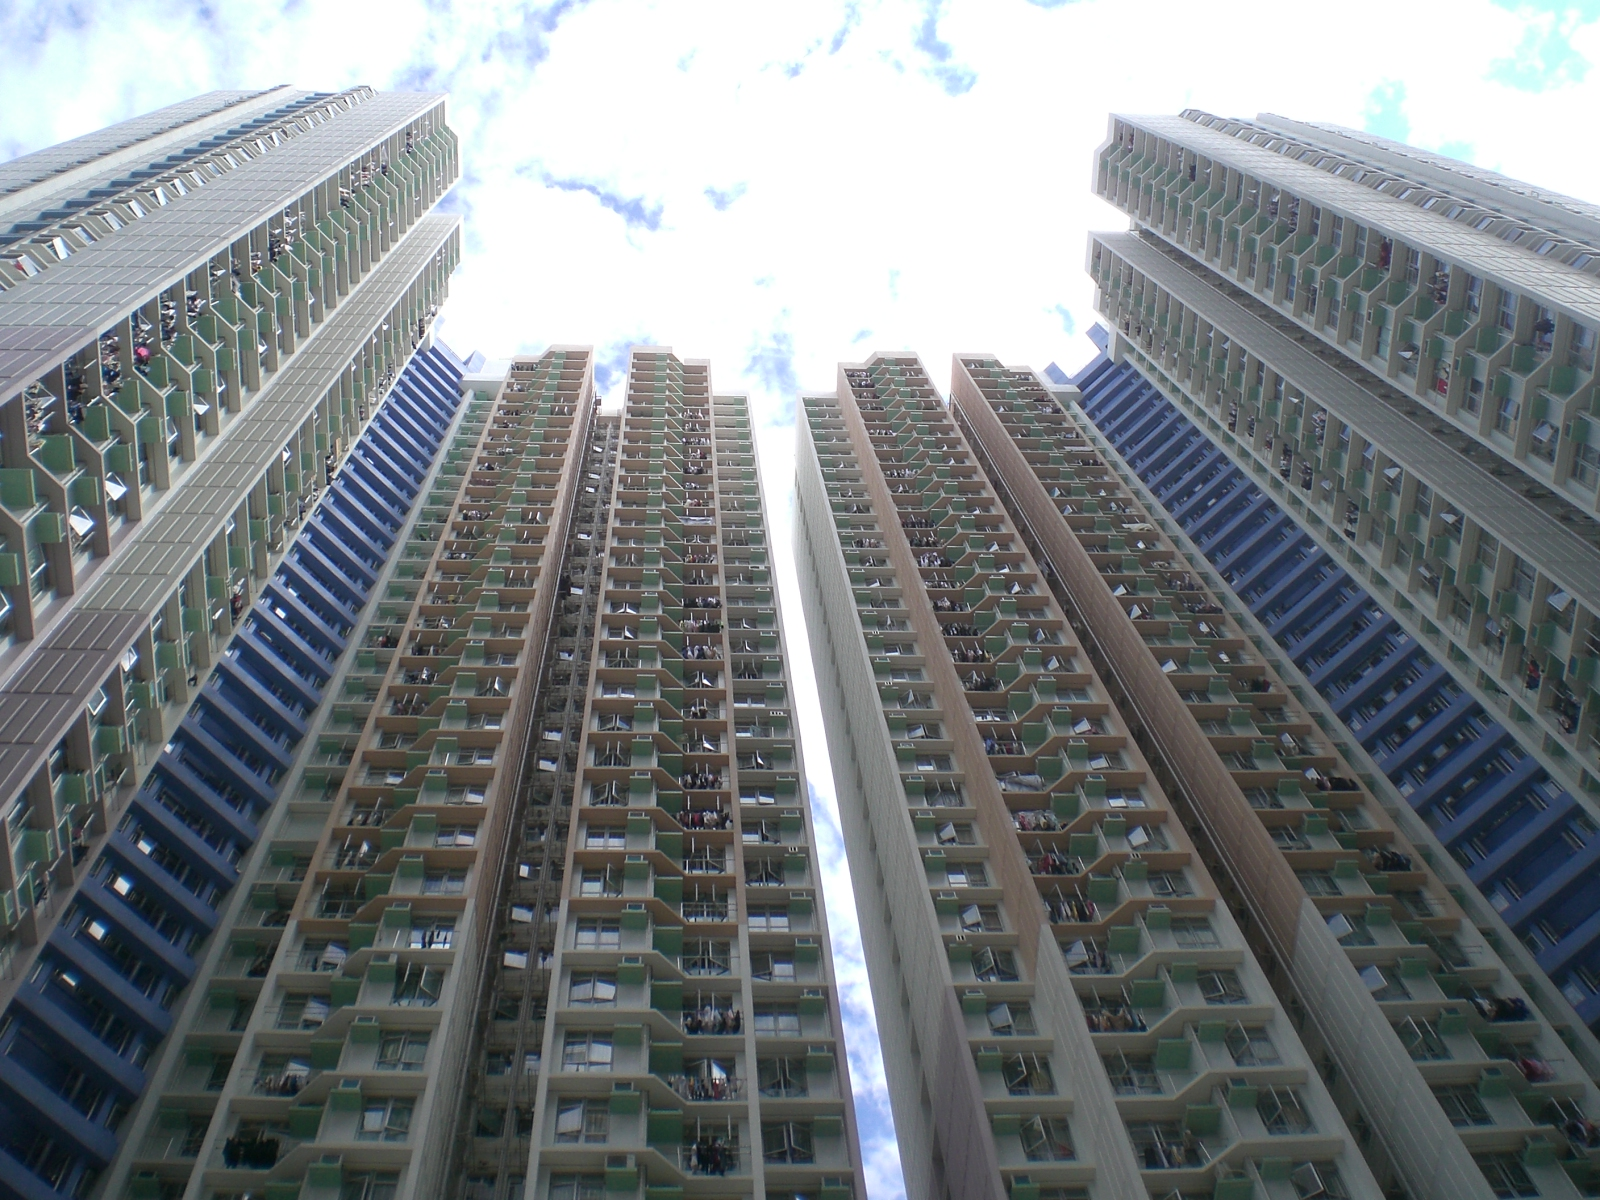 File:HK Shek Pai Wan Estate High-rise buildings.JPG - Wikimedia Commons